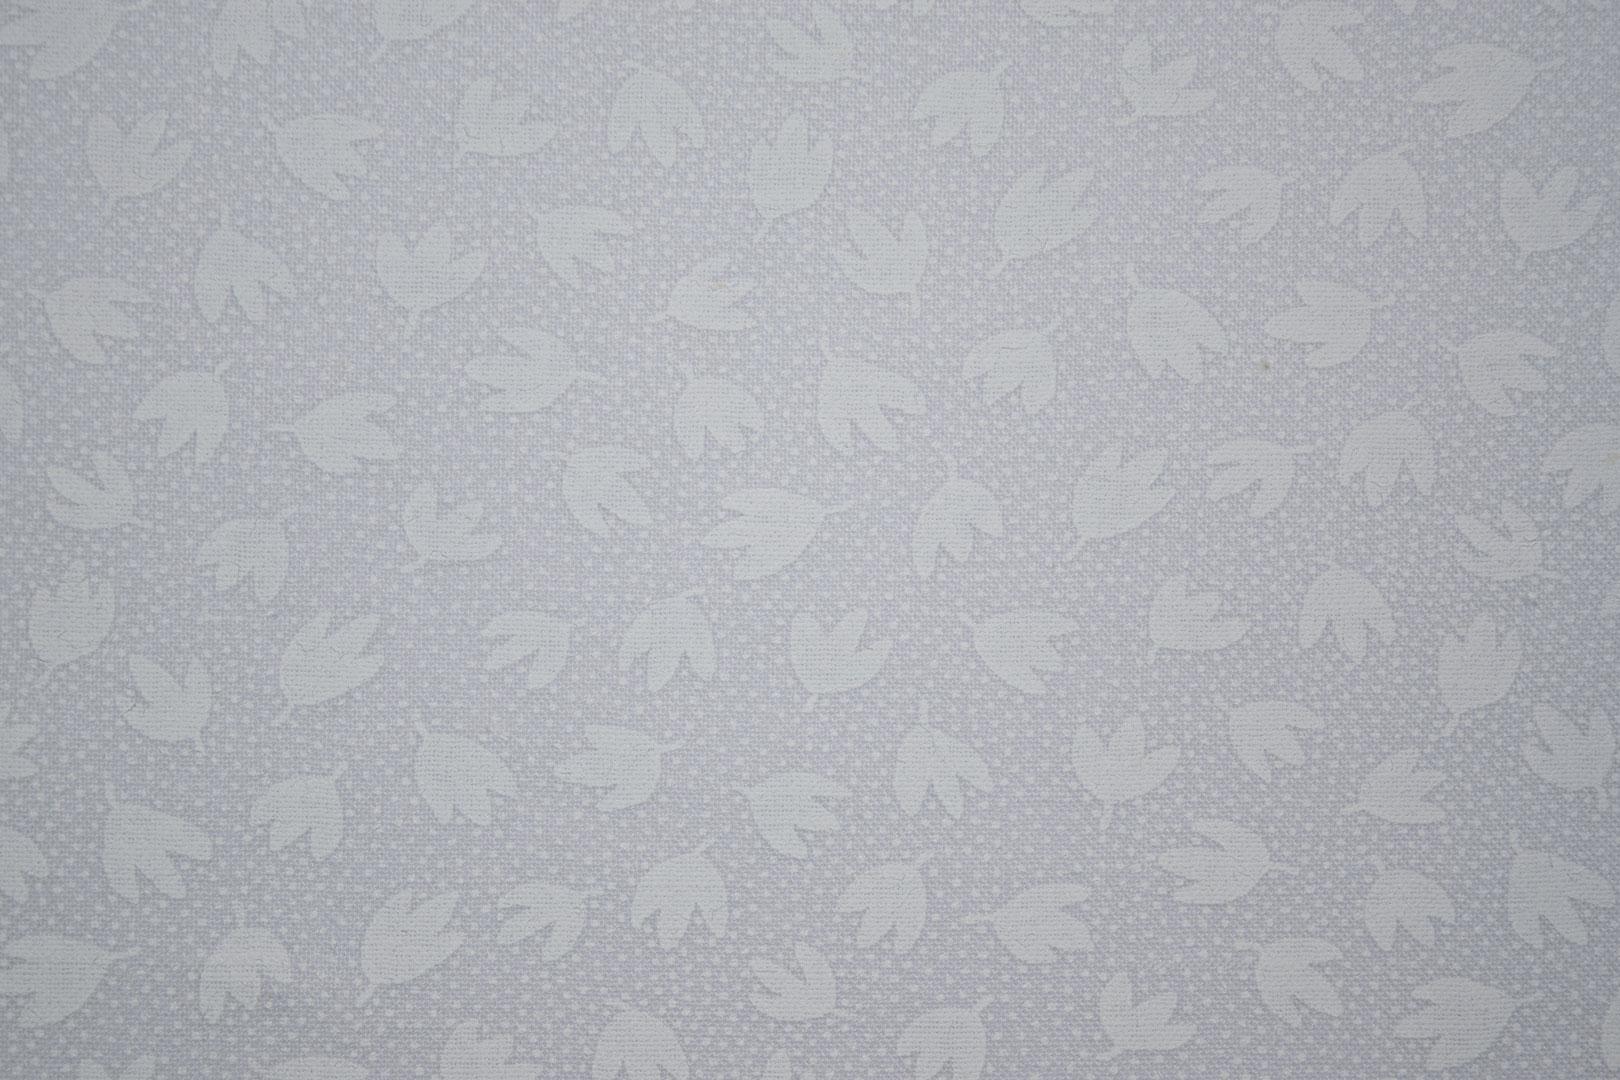 "149_47716_ww   45"" 68/68, 100% Carded Cotton"